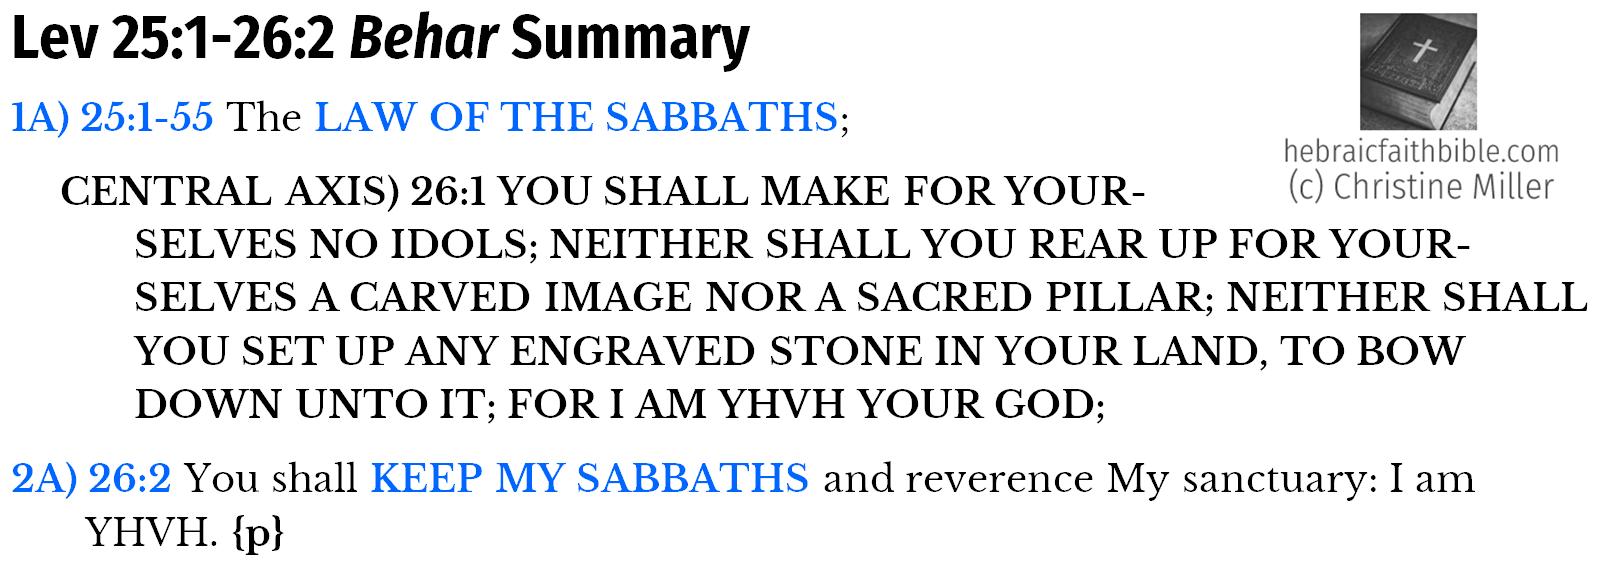 Lev 25:1-26:2 Behar summary chiasm | hebraicfaithbible.com